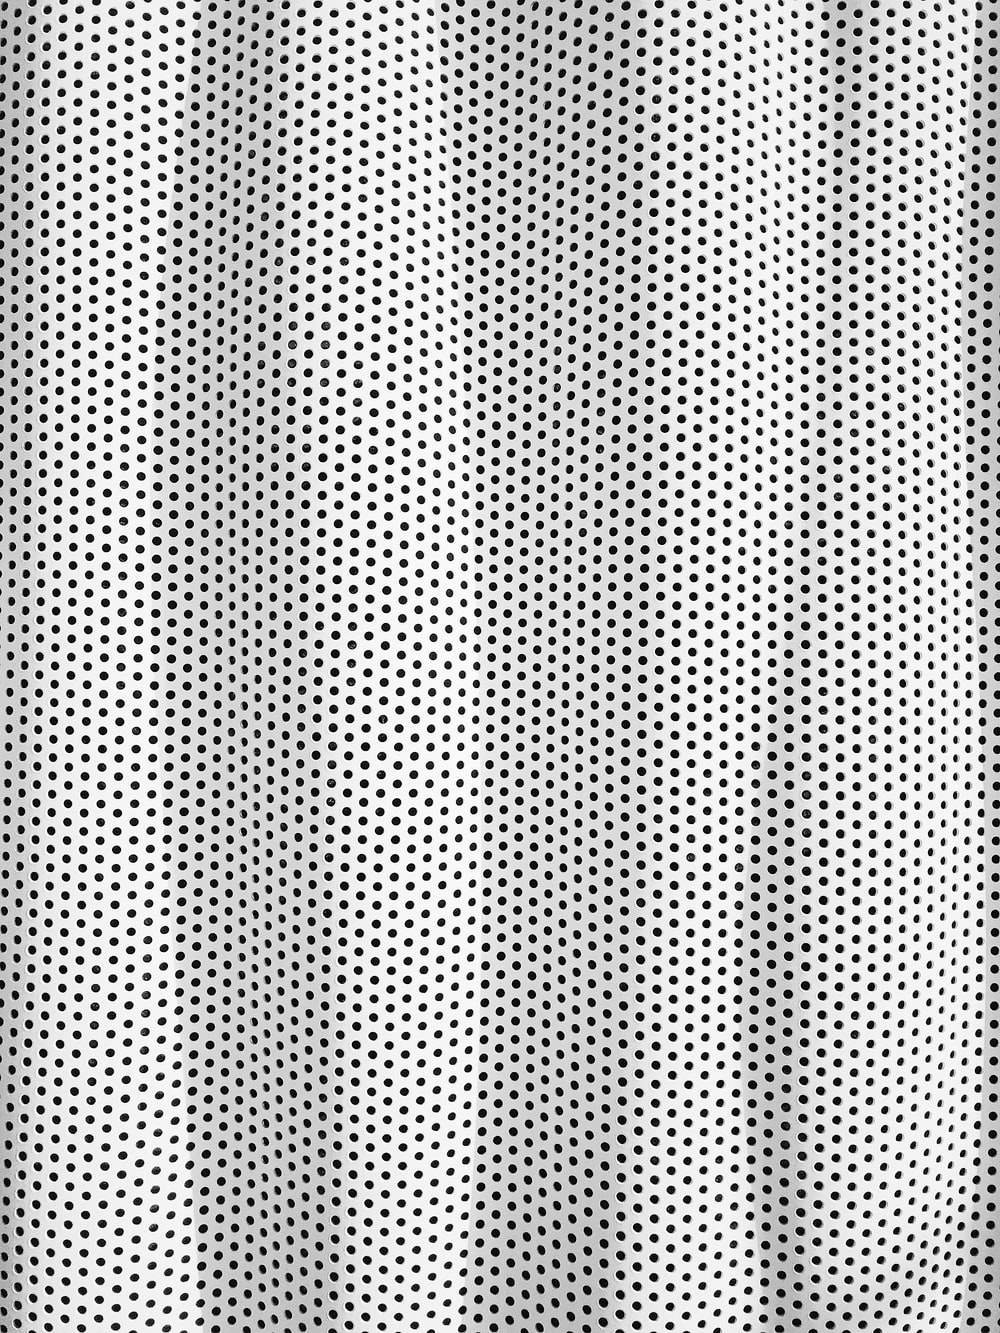 white and black polka dot textile